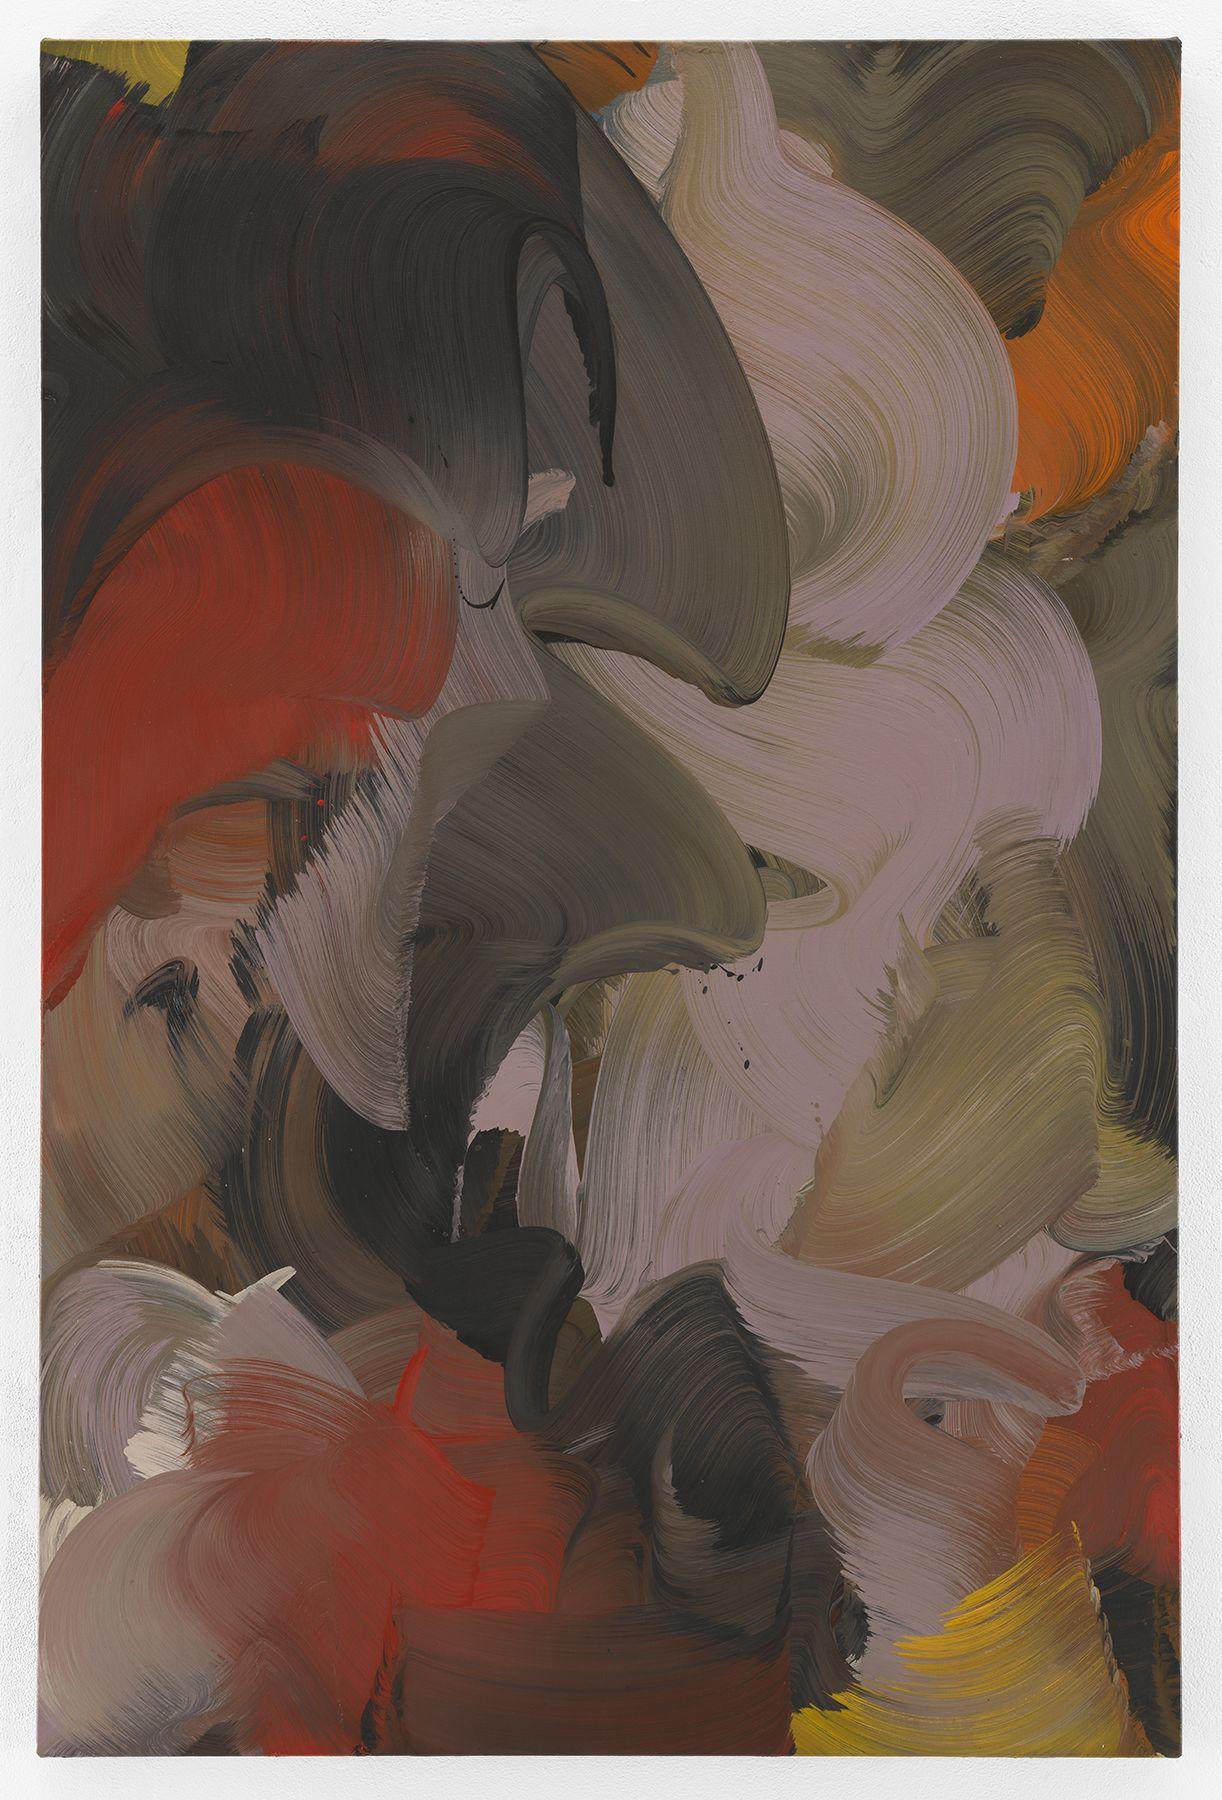 Fox's bride, 2018,Oil on canvas,59.5 x 39.5 inches,151.1 x 100.3 cm,MMG#30260